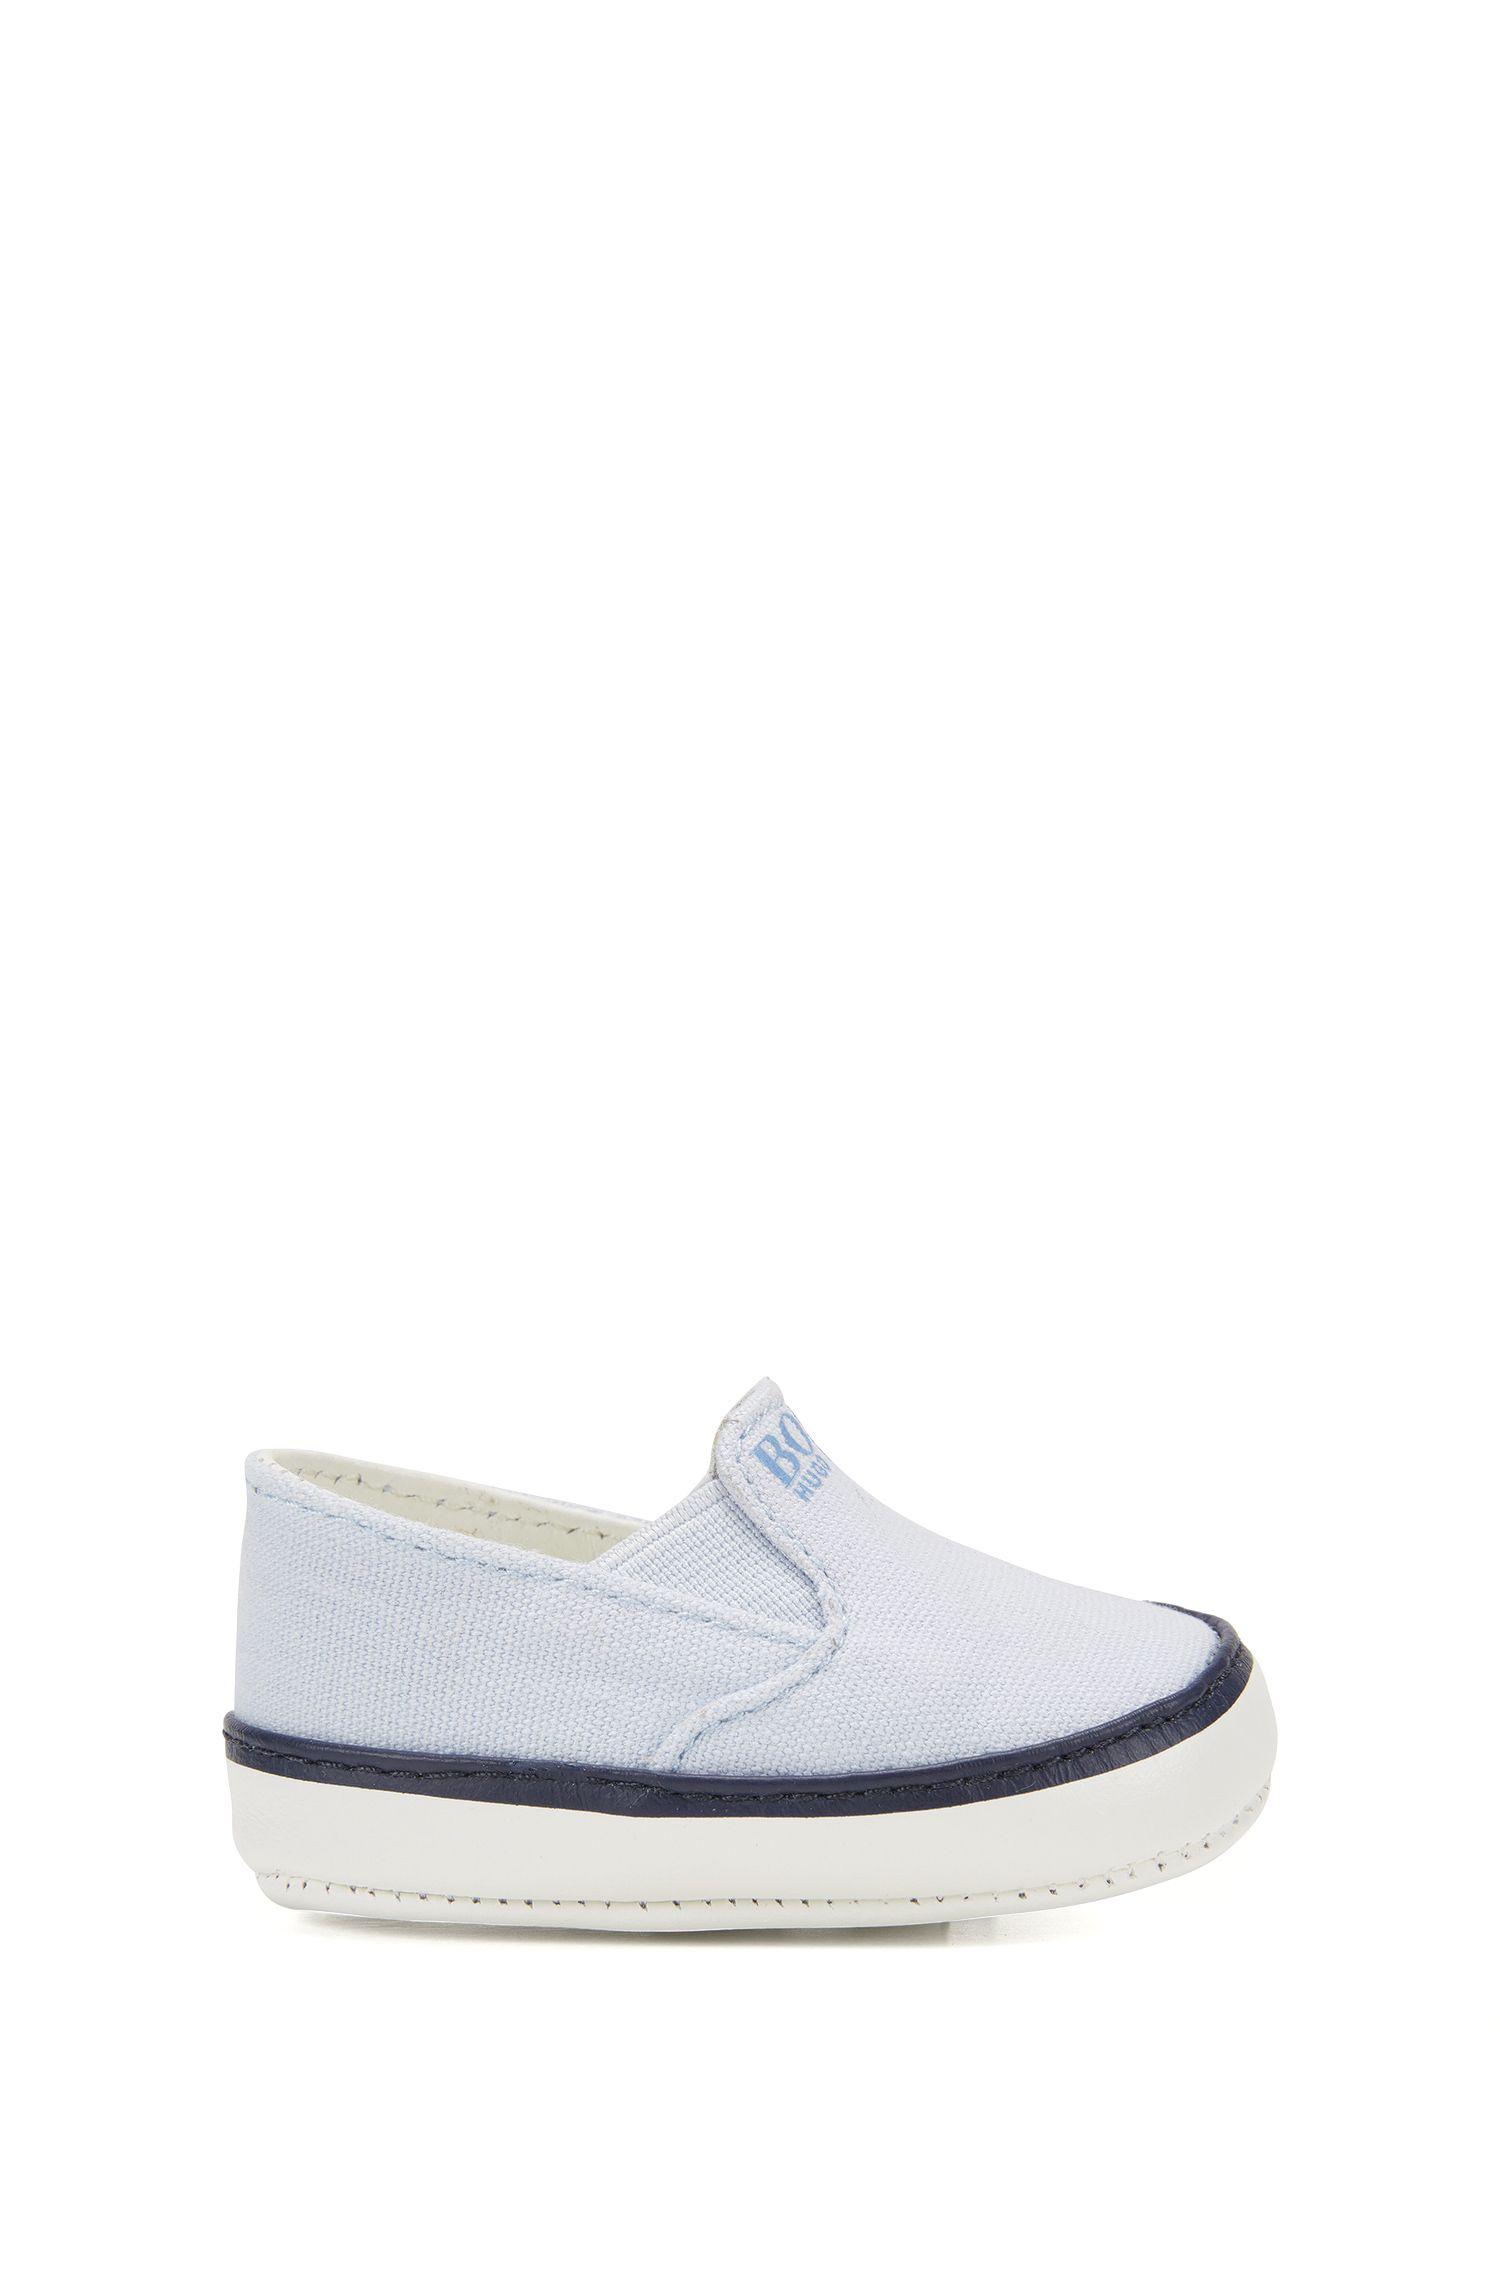 Baby-Schuhe mit Ledersohle: 'J99050'